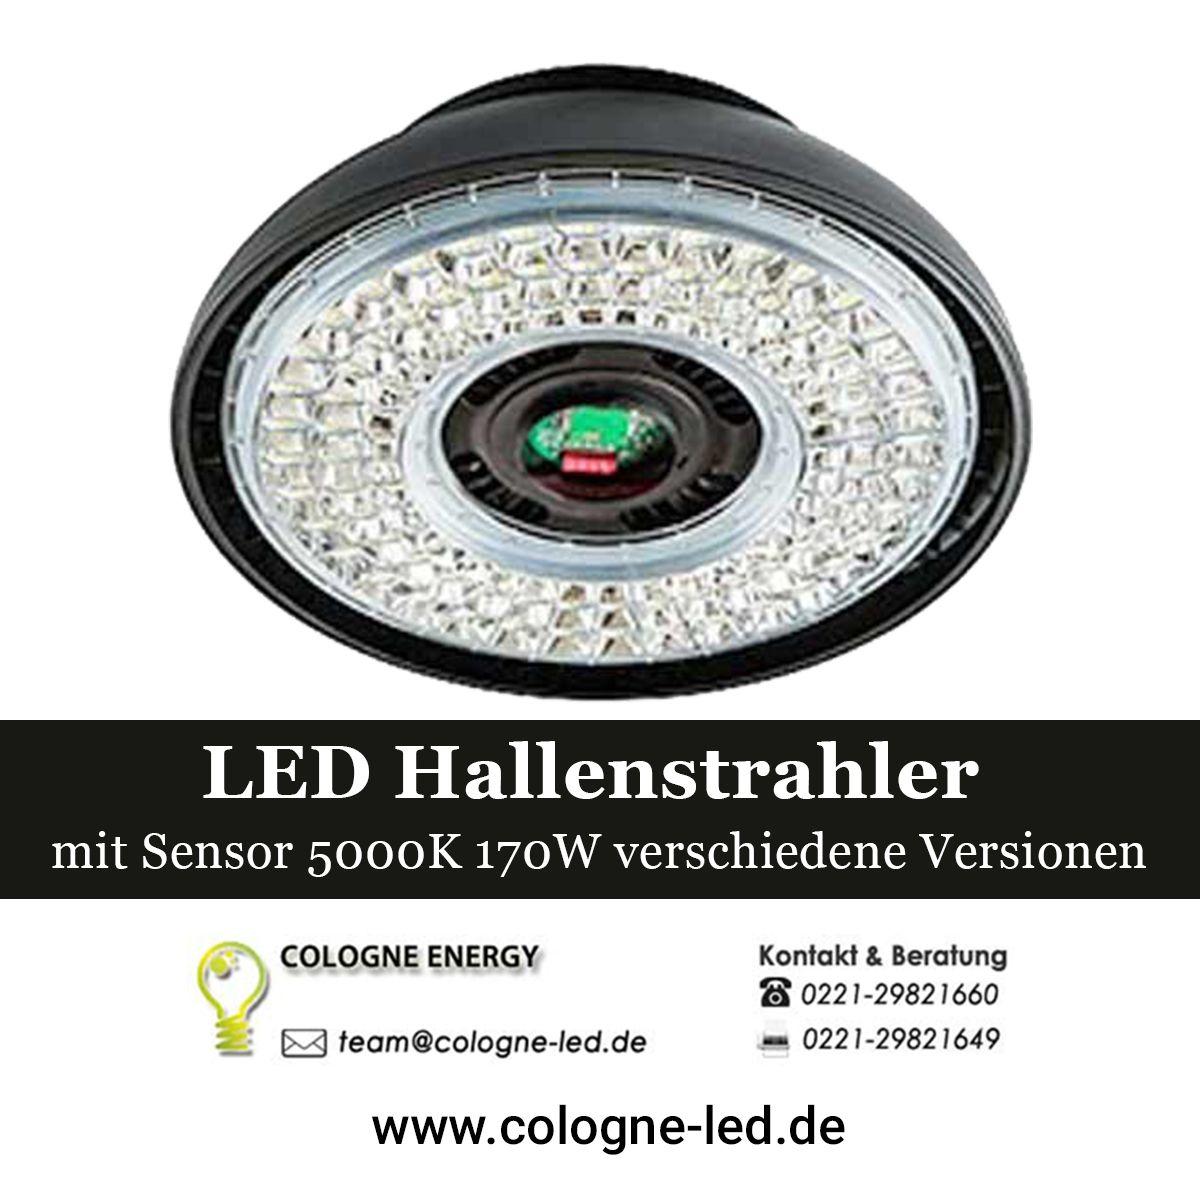 Led Hallenstrahler Mit Sensor 5000k 170w Verschiedene Versionen Led